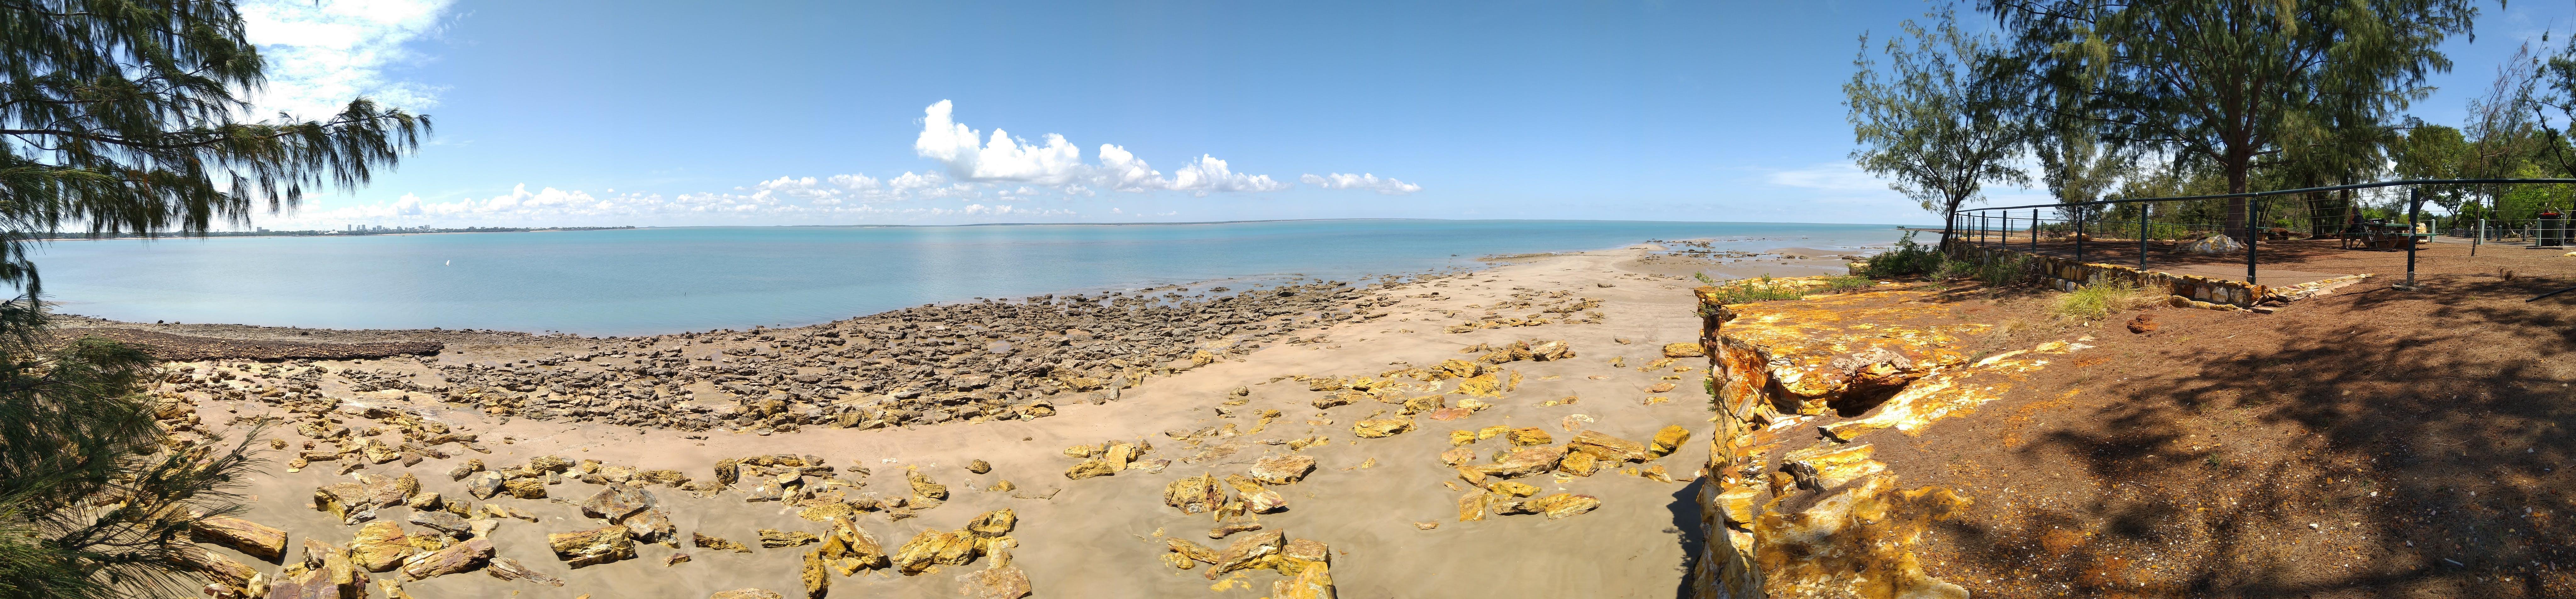 Free stock photo of beach, panorama photo, tropics